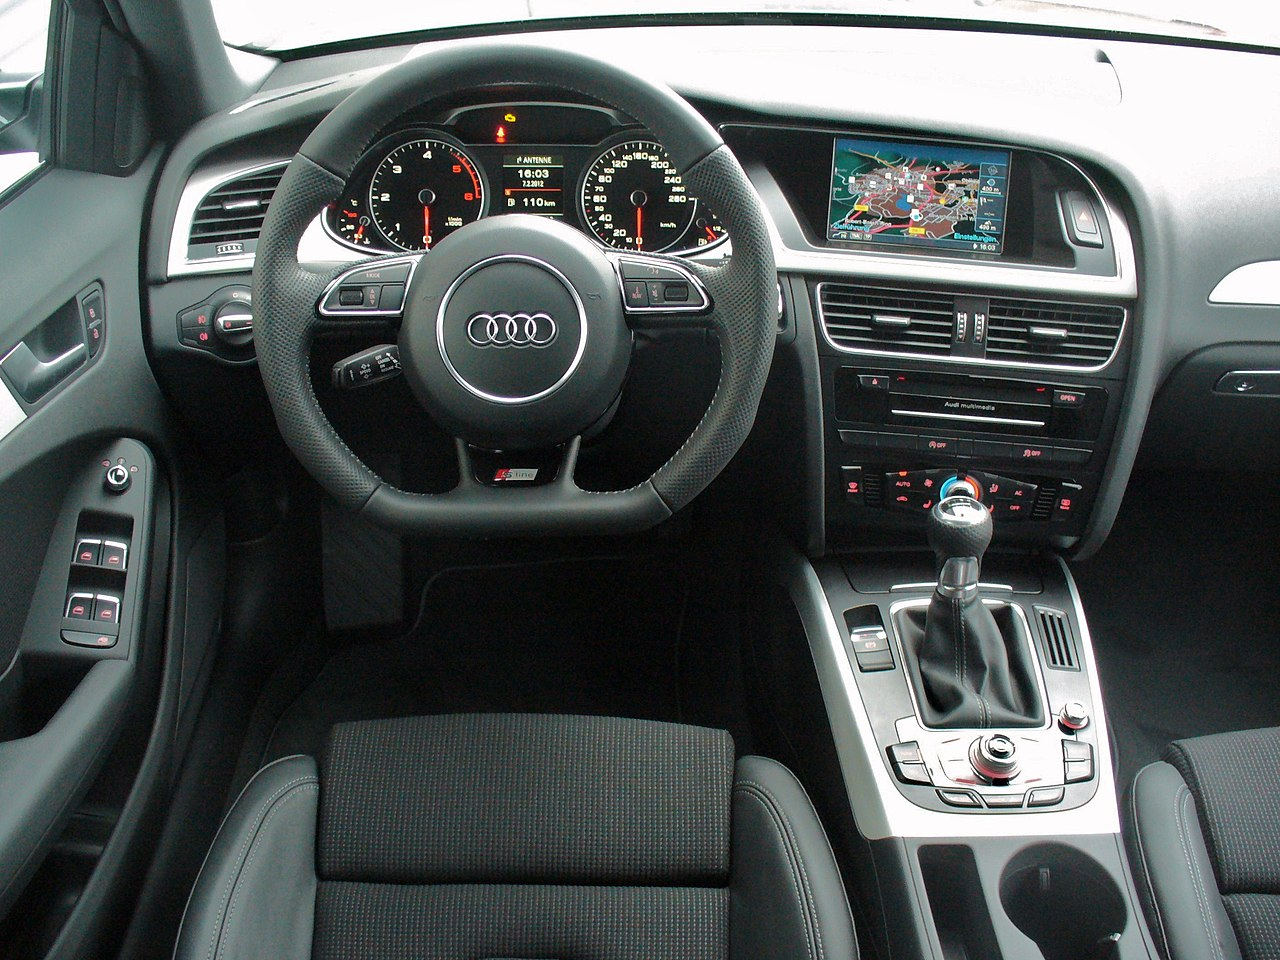 Datei:Audi A4 B8 Facelift Avant Ambition S line 2.0 TDI Daytonagrau ...